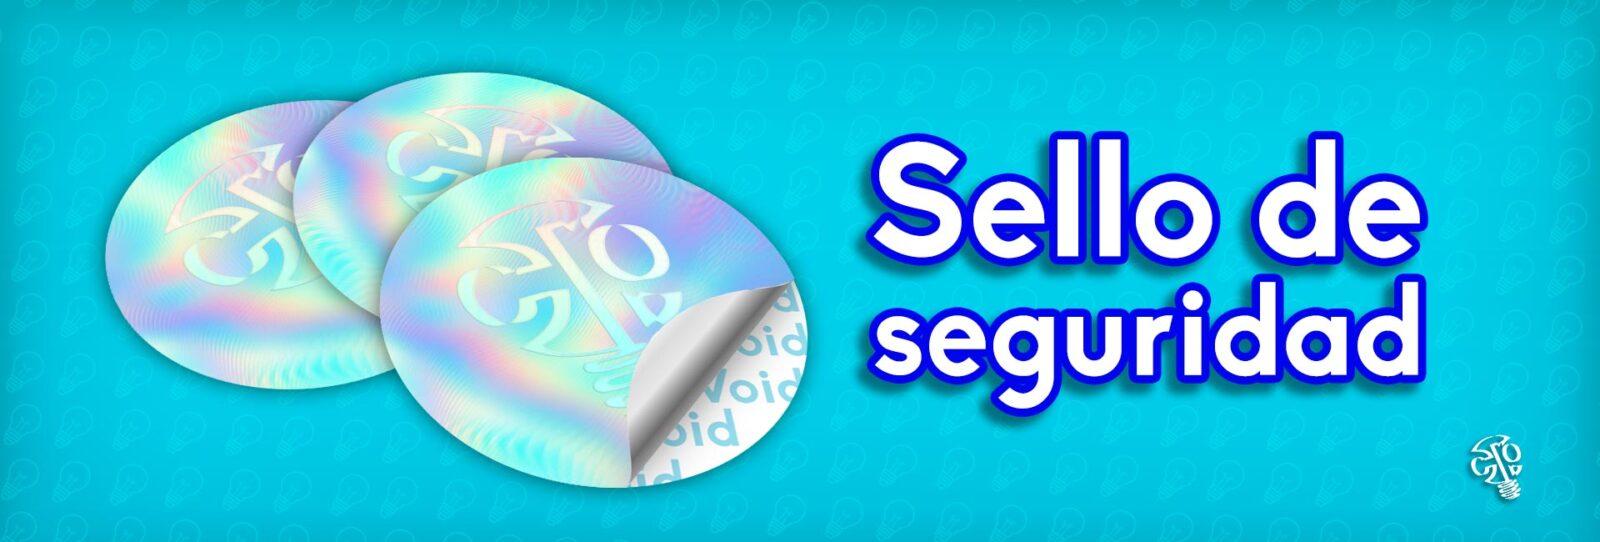 b_6_Etiquetas_seguridad